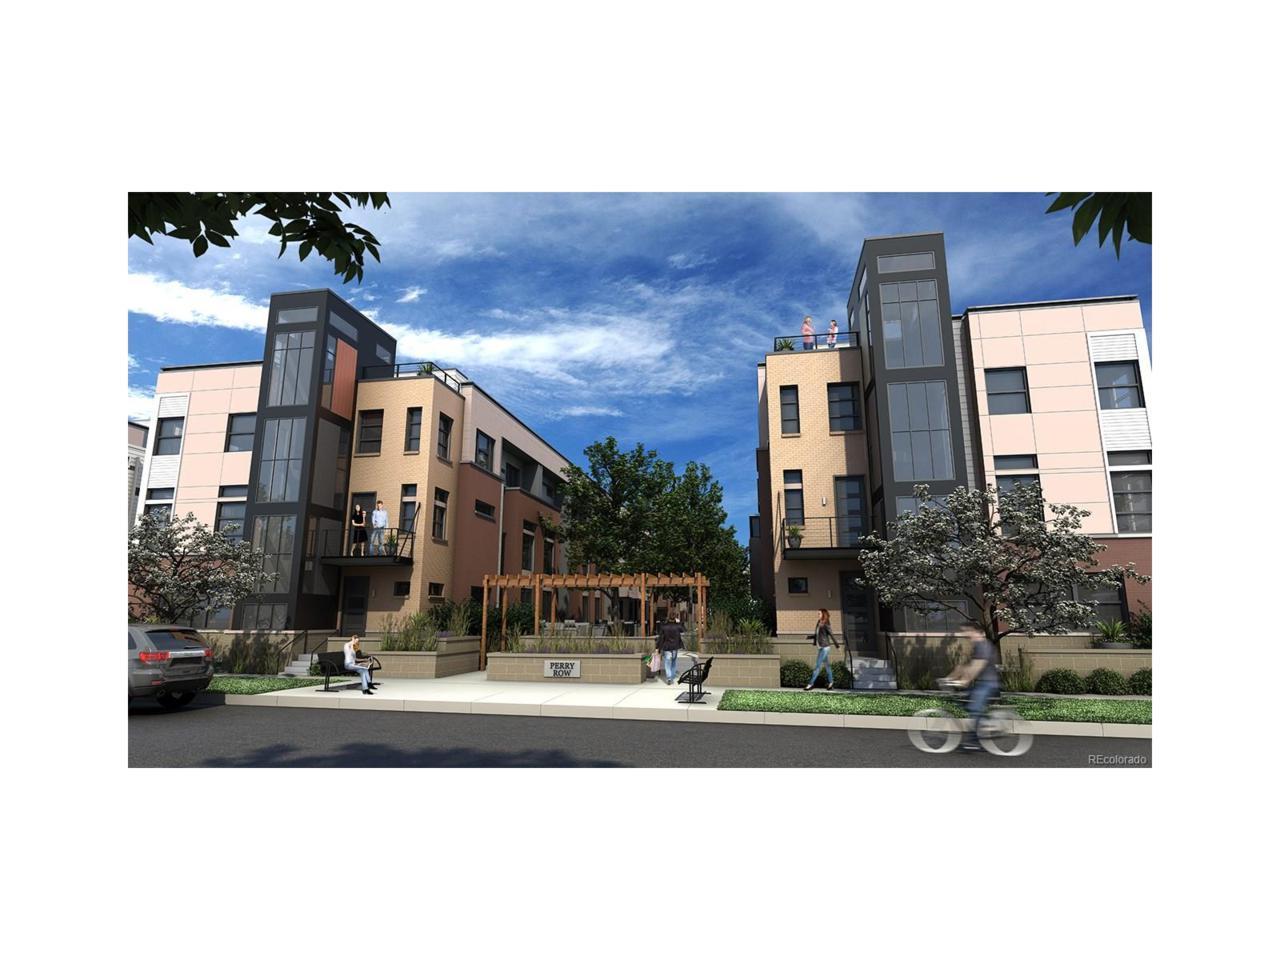 4033 W Conejos Place, Denver, CO 80204 (MLS #4242840) :: 8z Real Estate